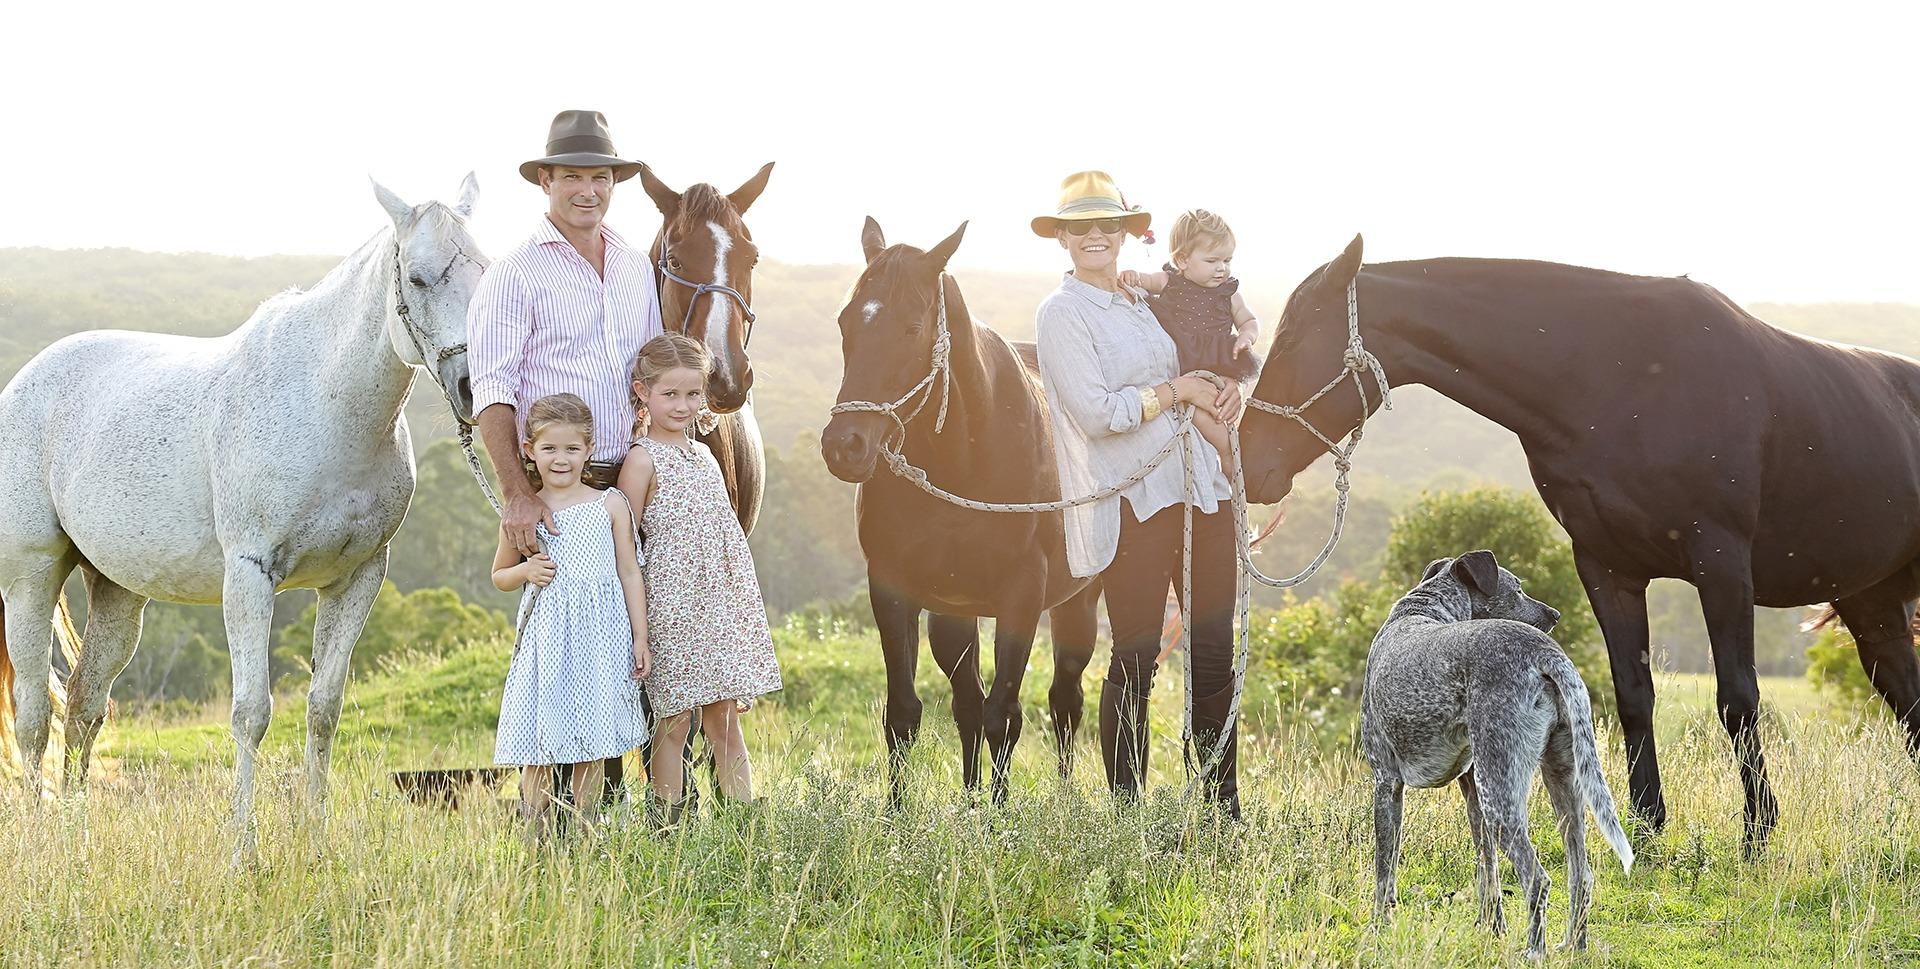 Globetrotting family